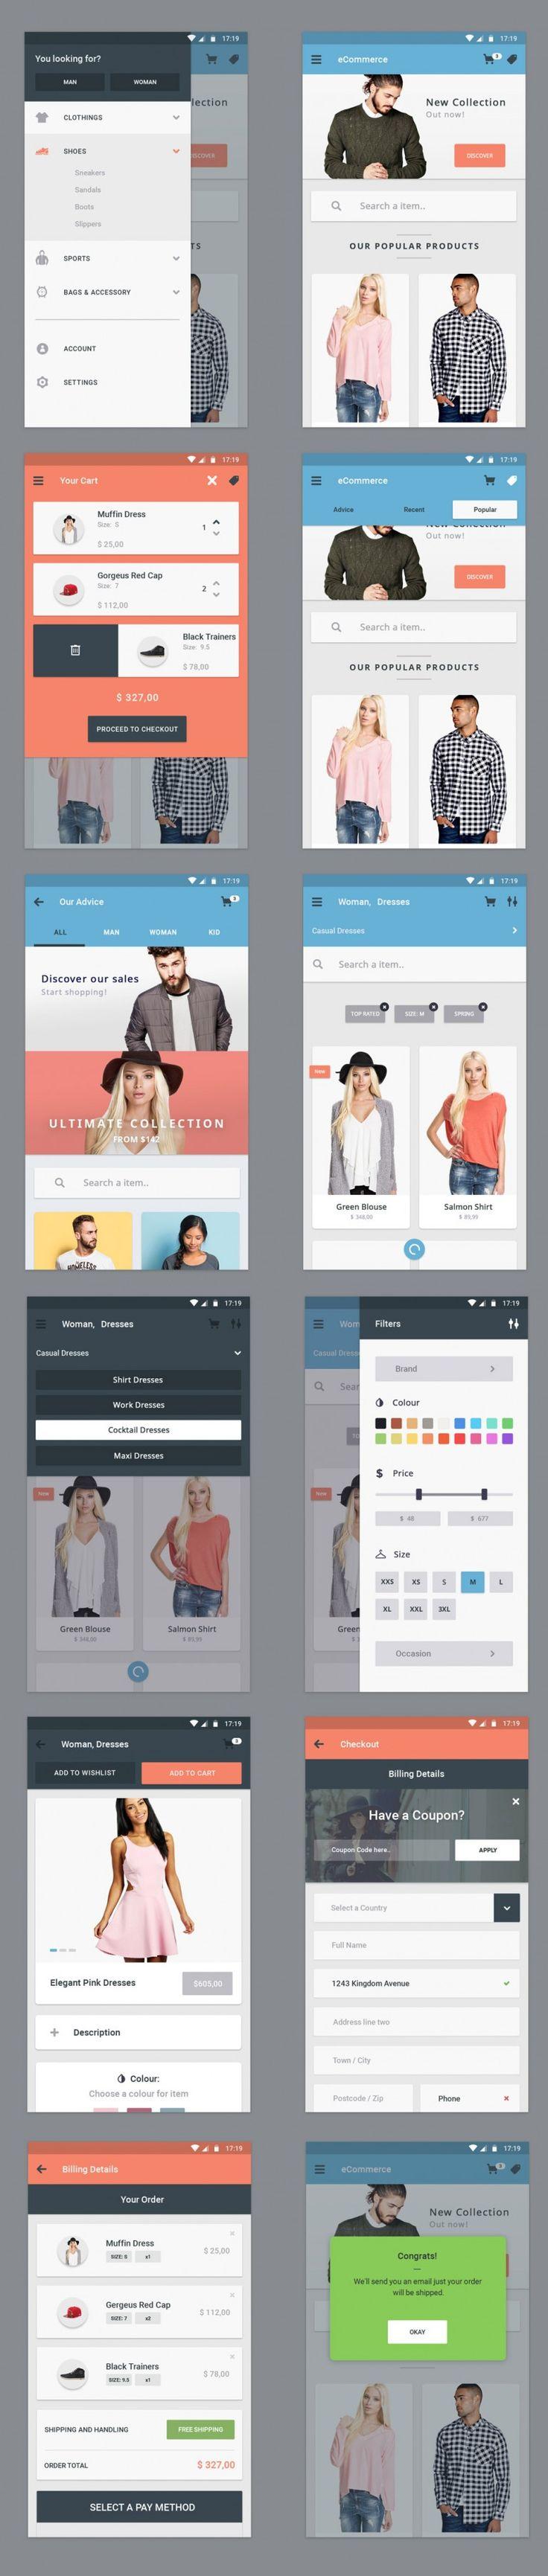 Free Ecommerce App UI Designs